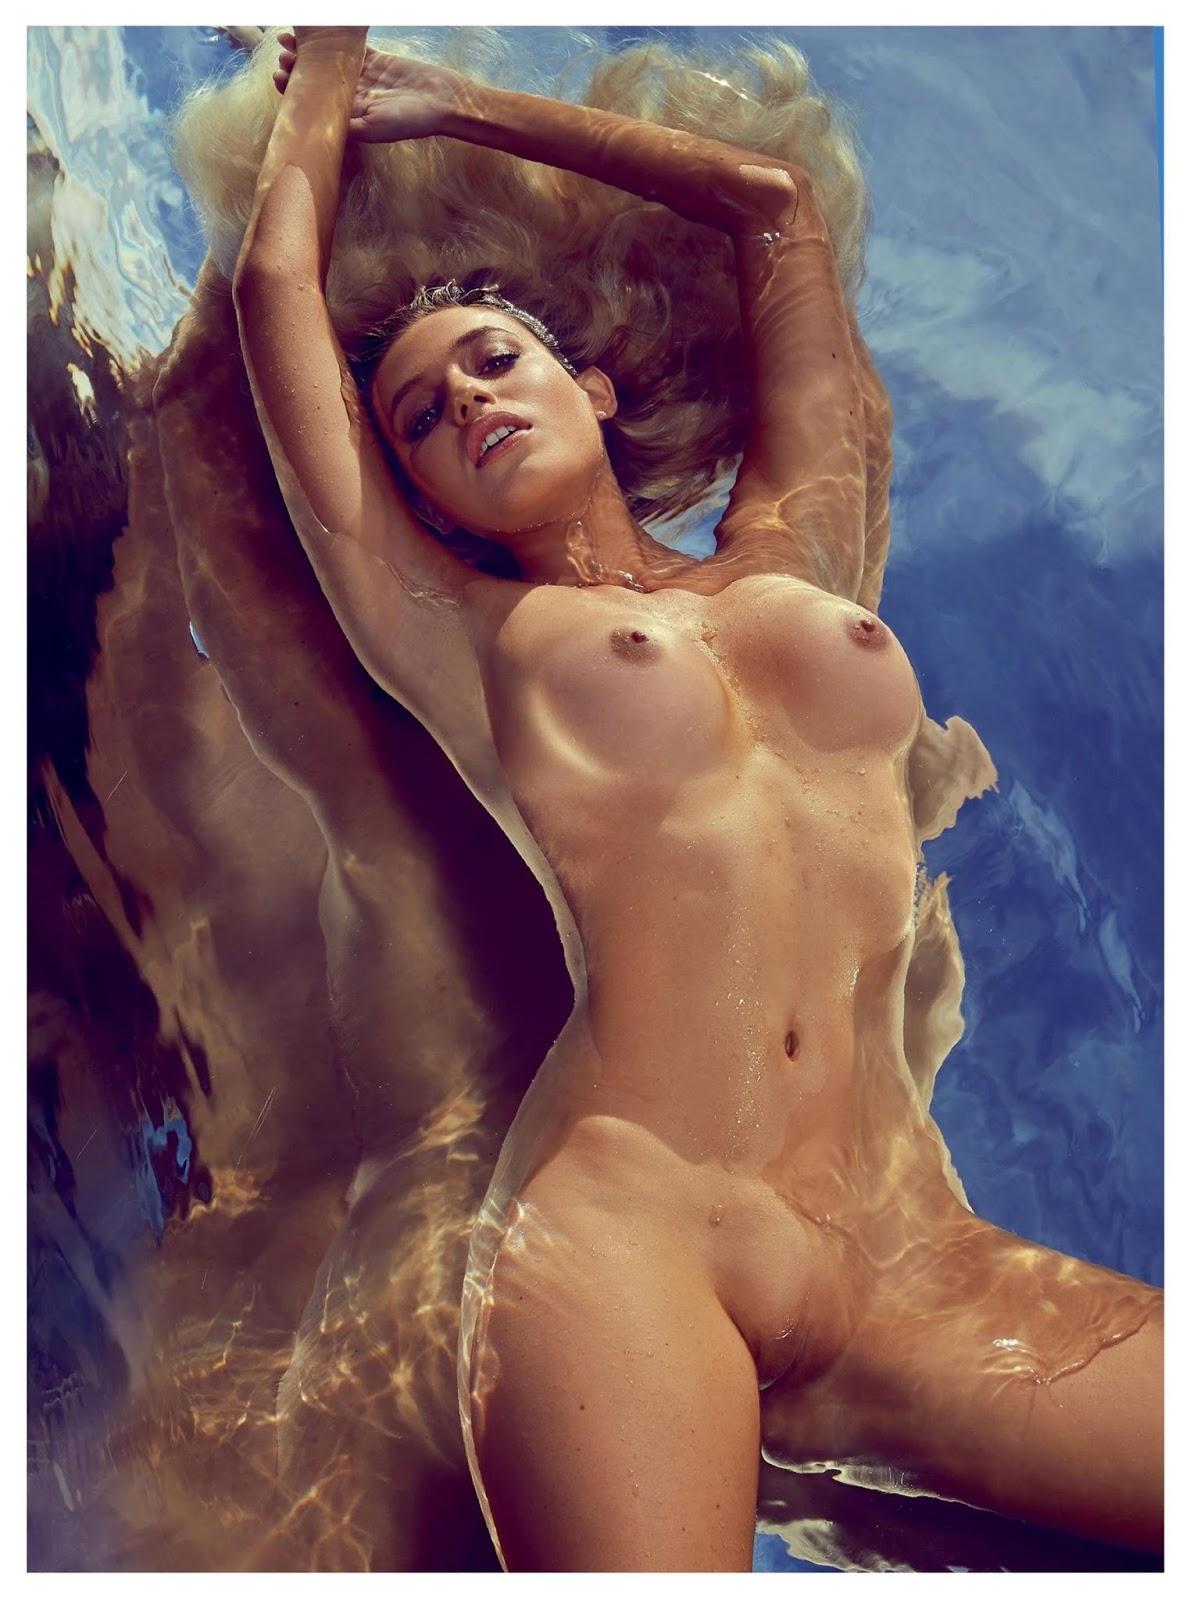 hot sims girl nude